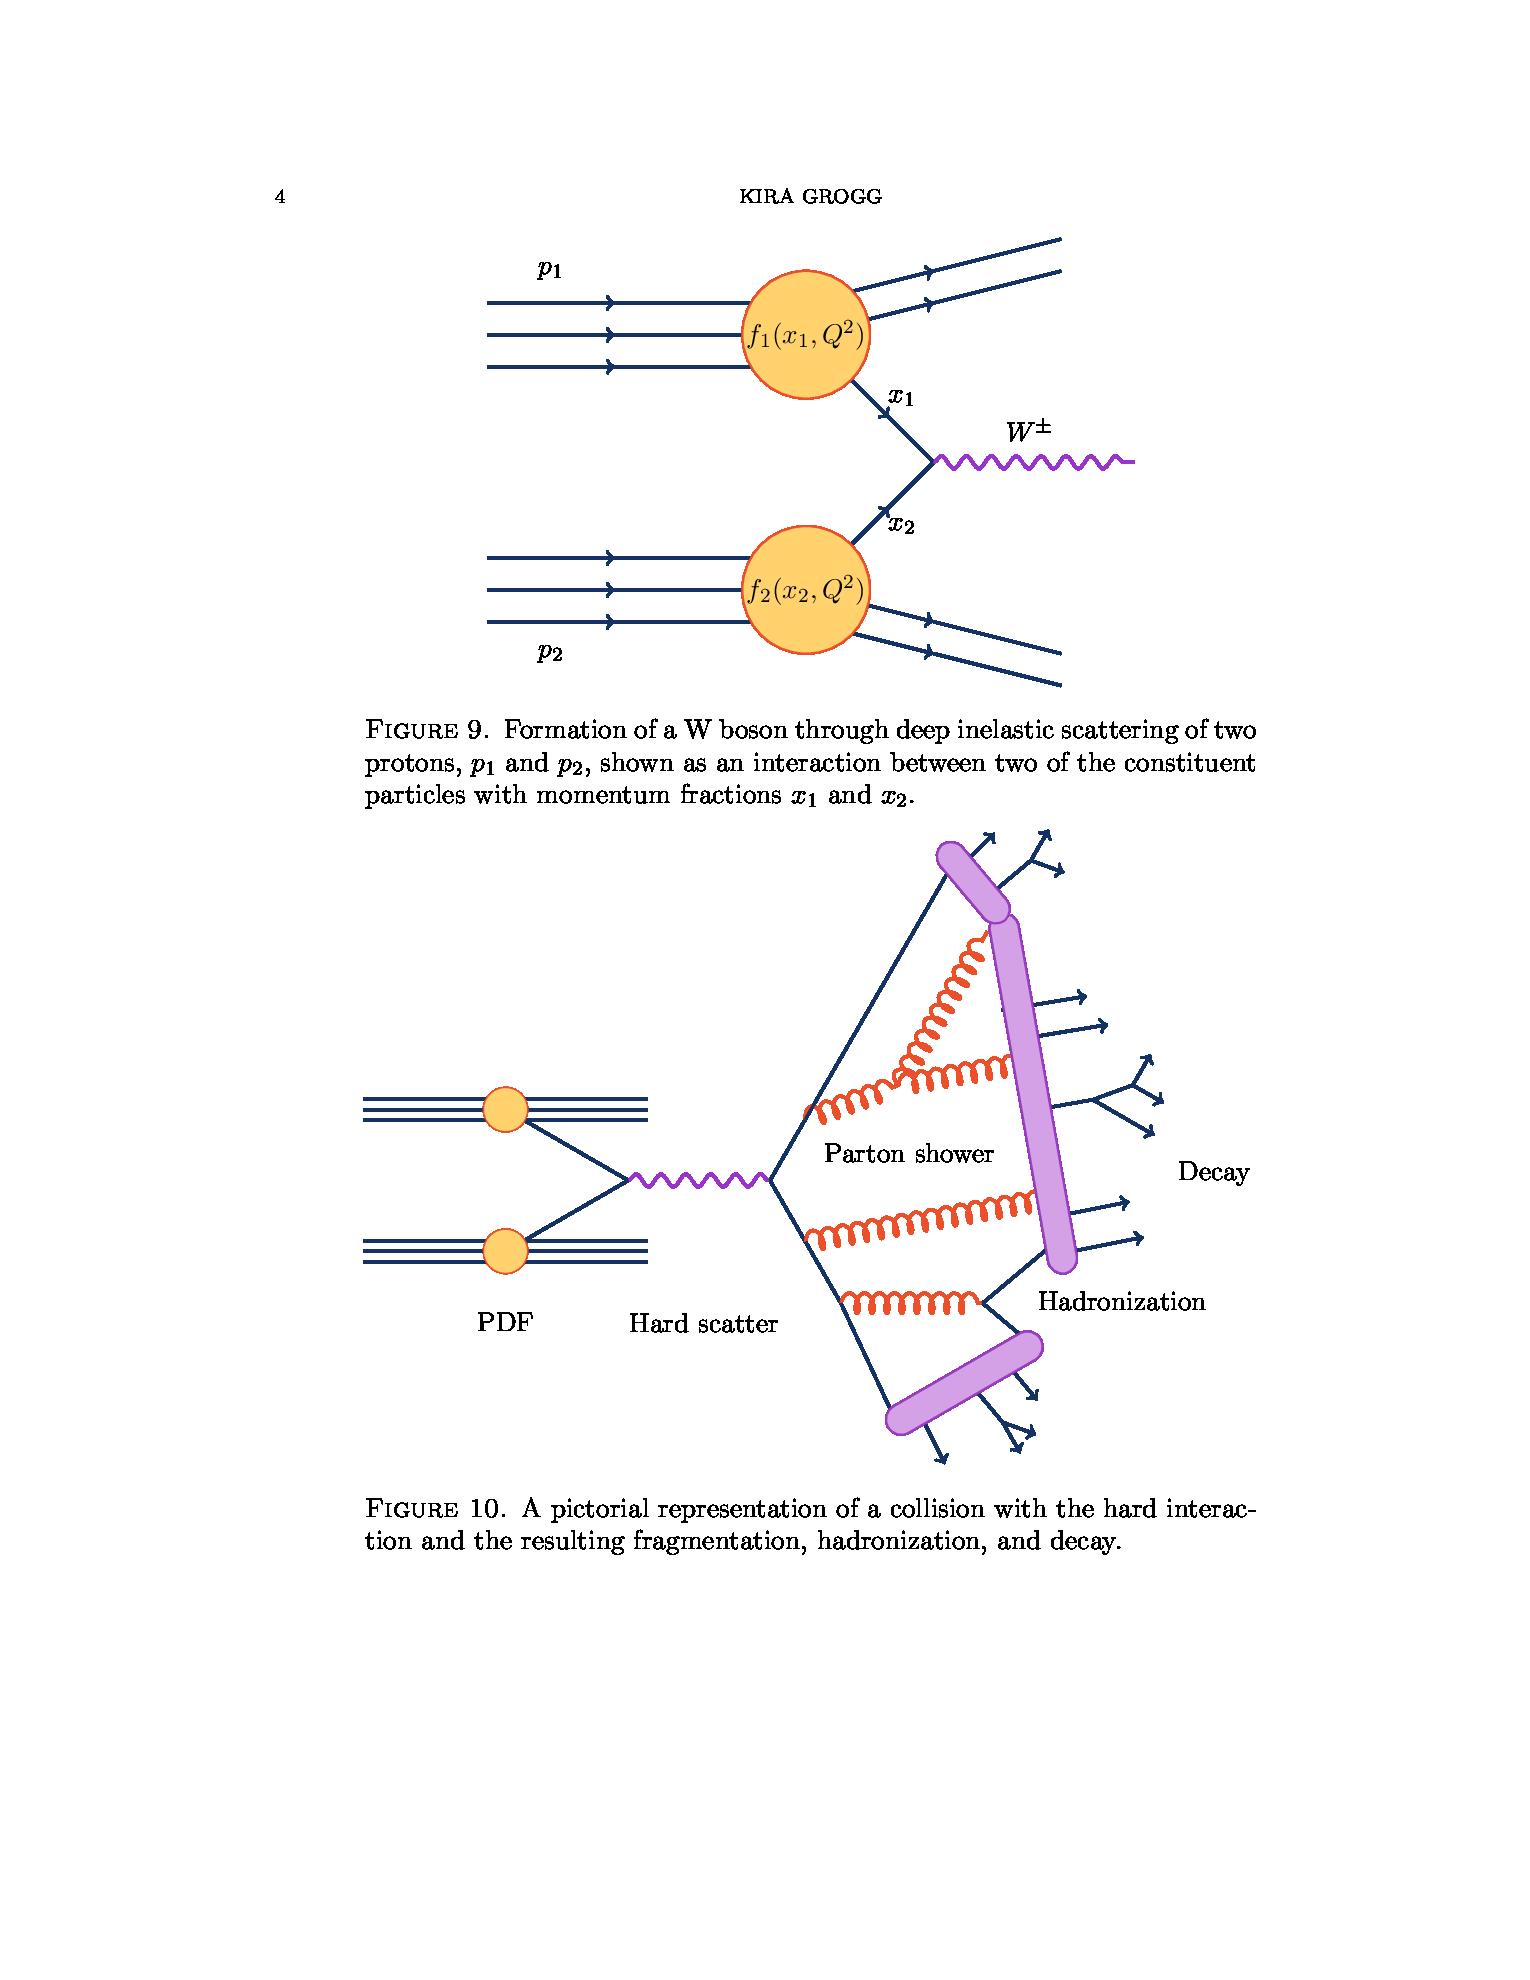 TiKZ 绘制费曼图所需的基本图元和示例